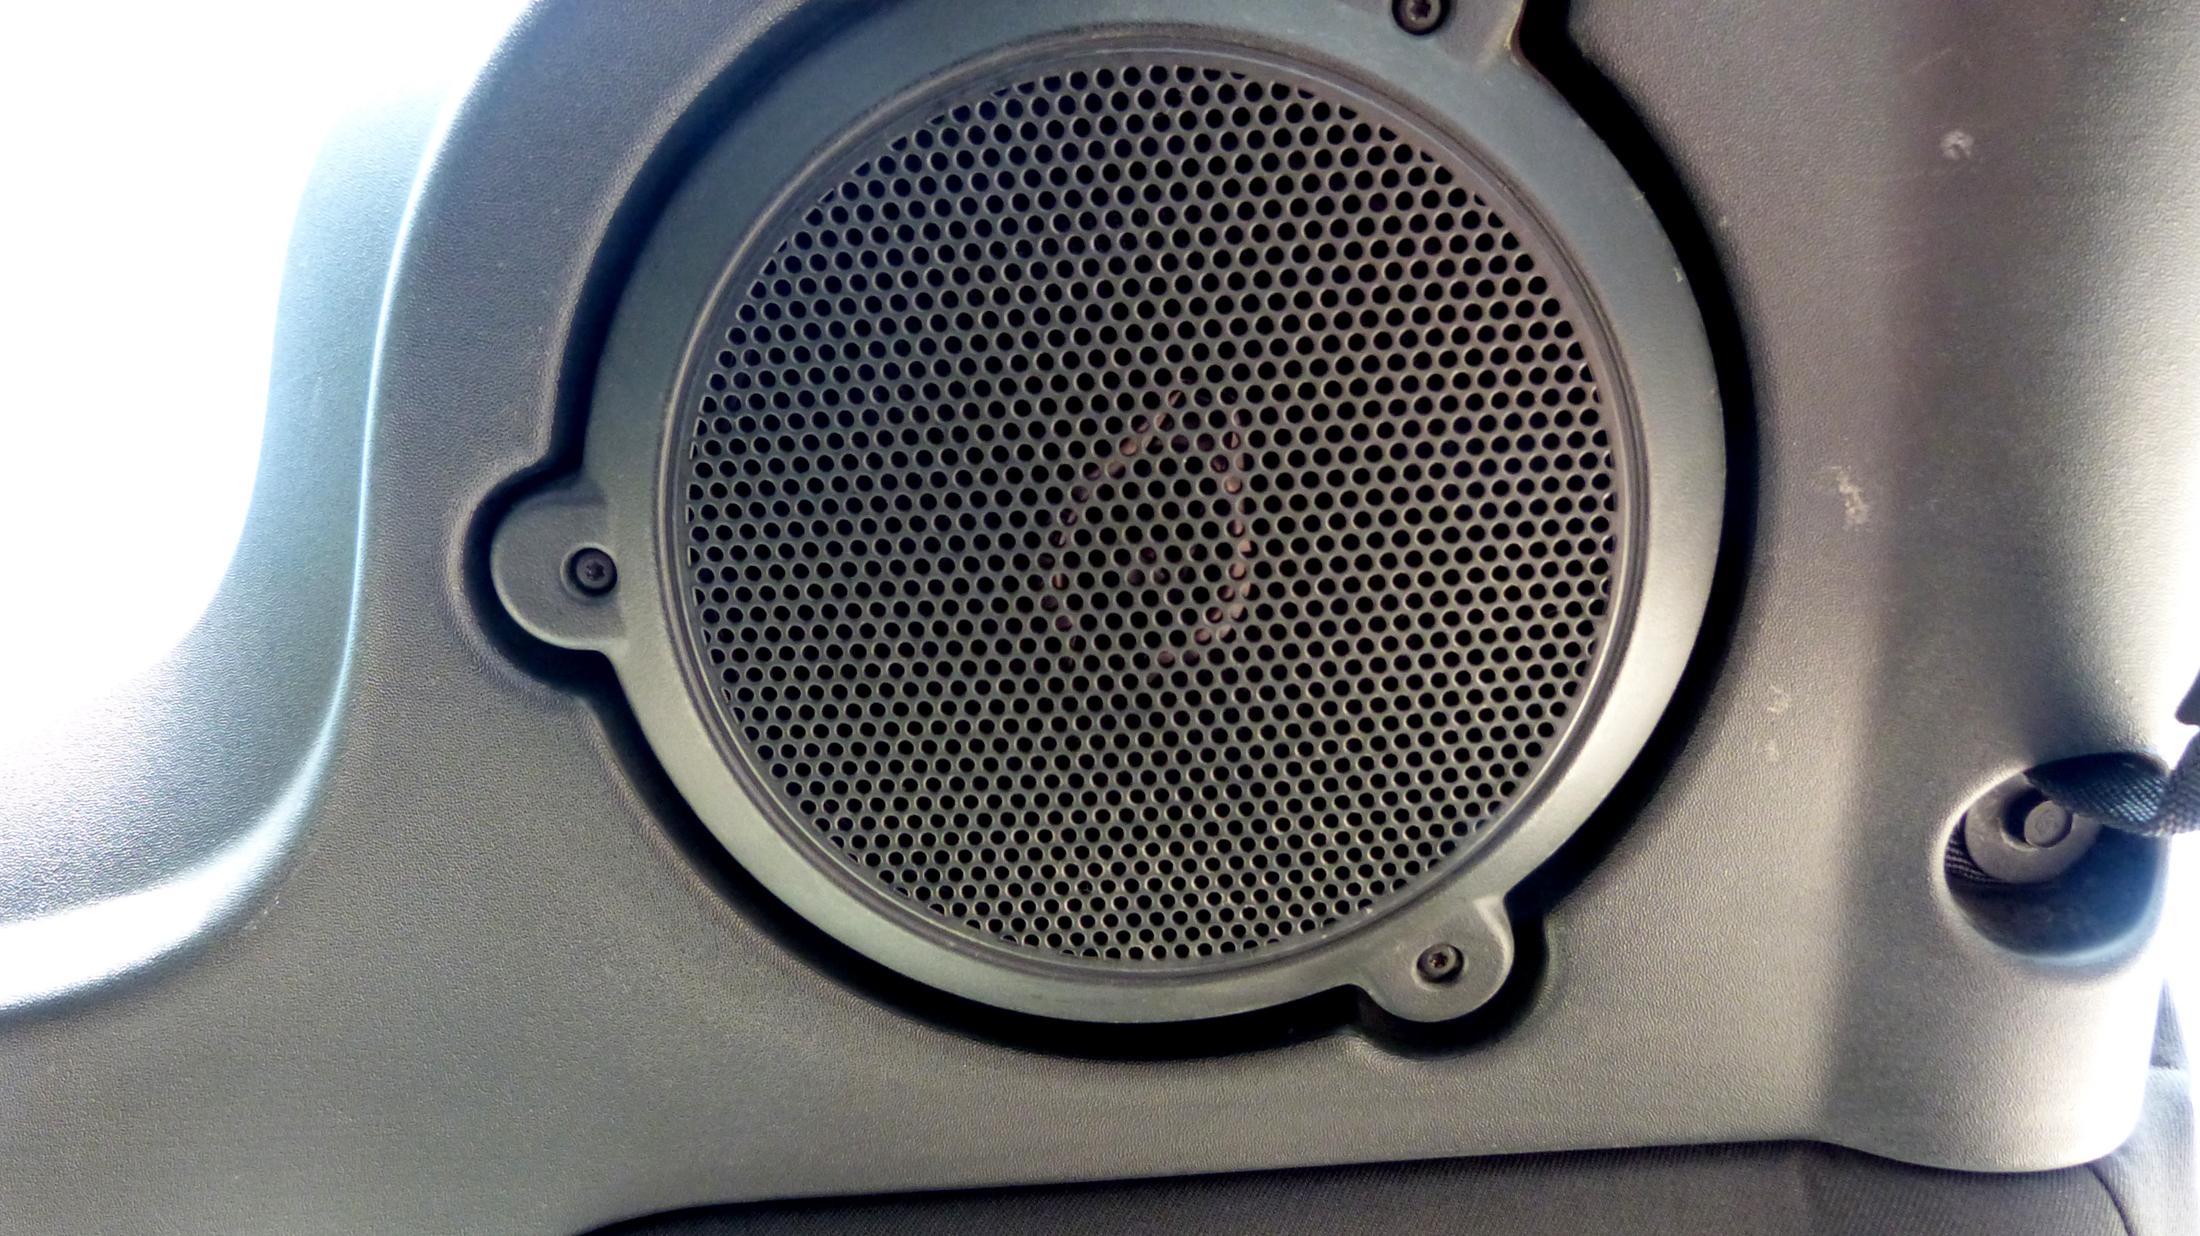 Jeep Wrangler Unlimited Santa Fe Auto Sound Jk Subwoofer Upgrade Feature Image